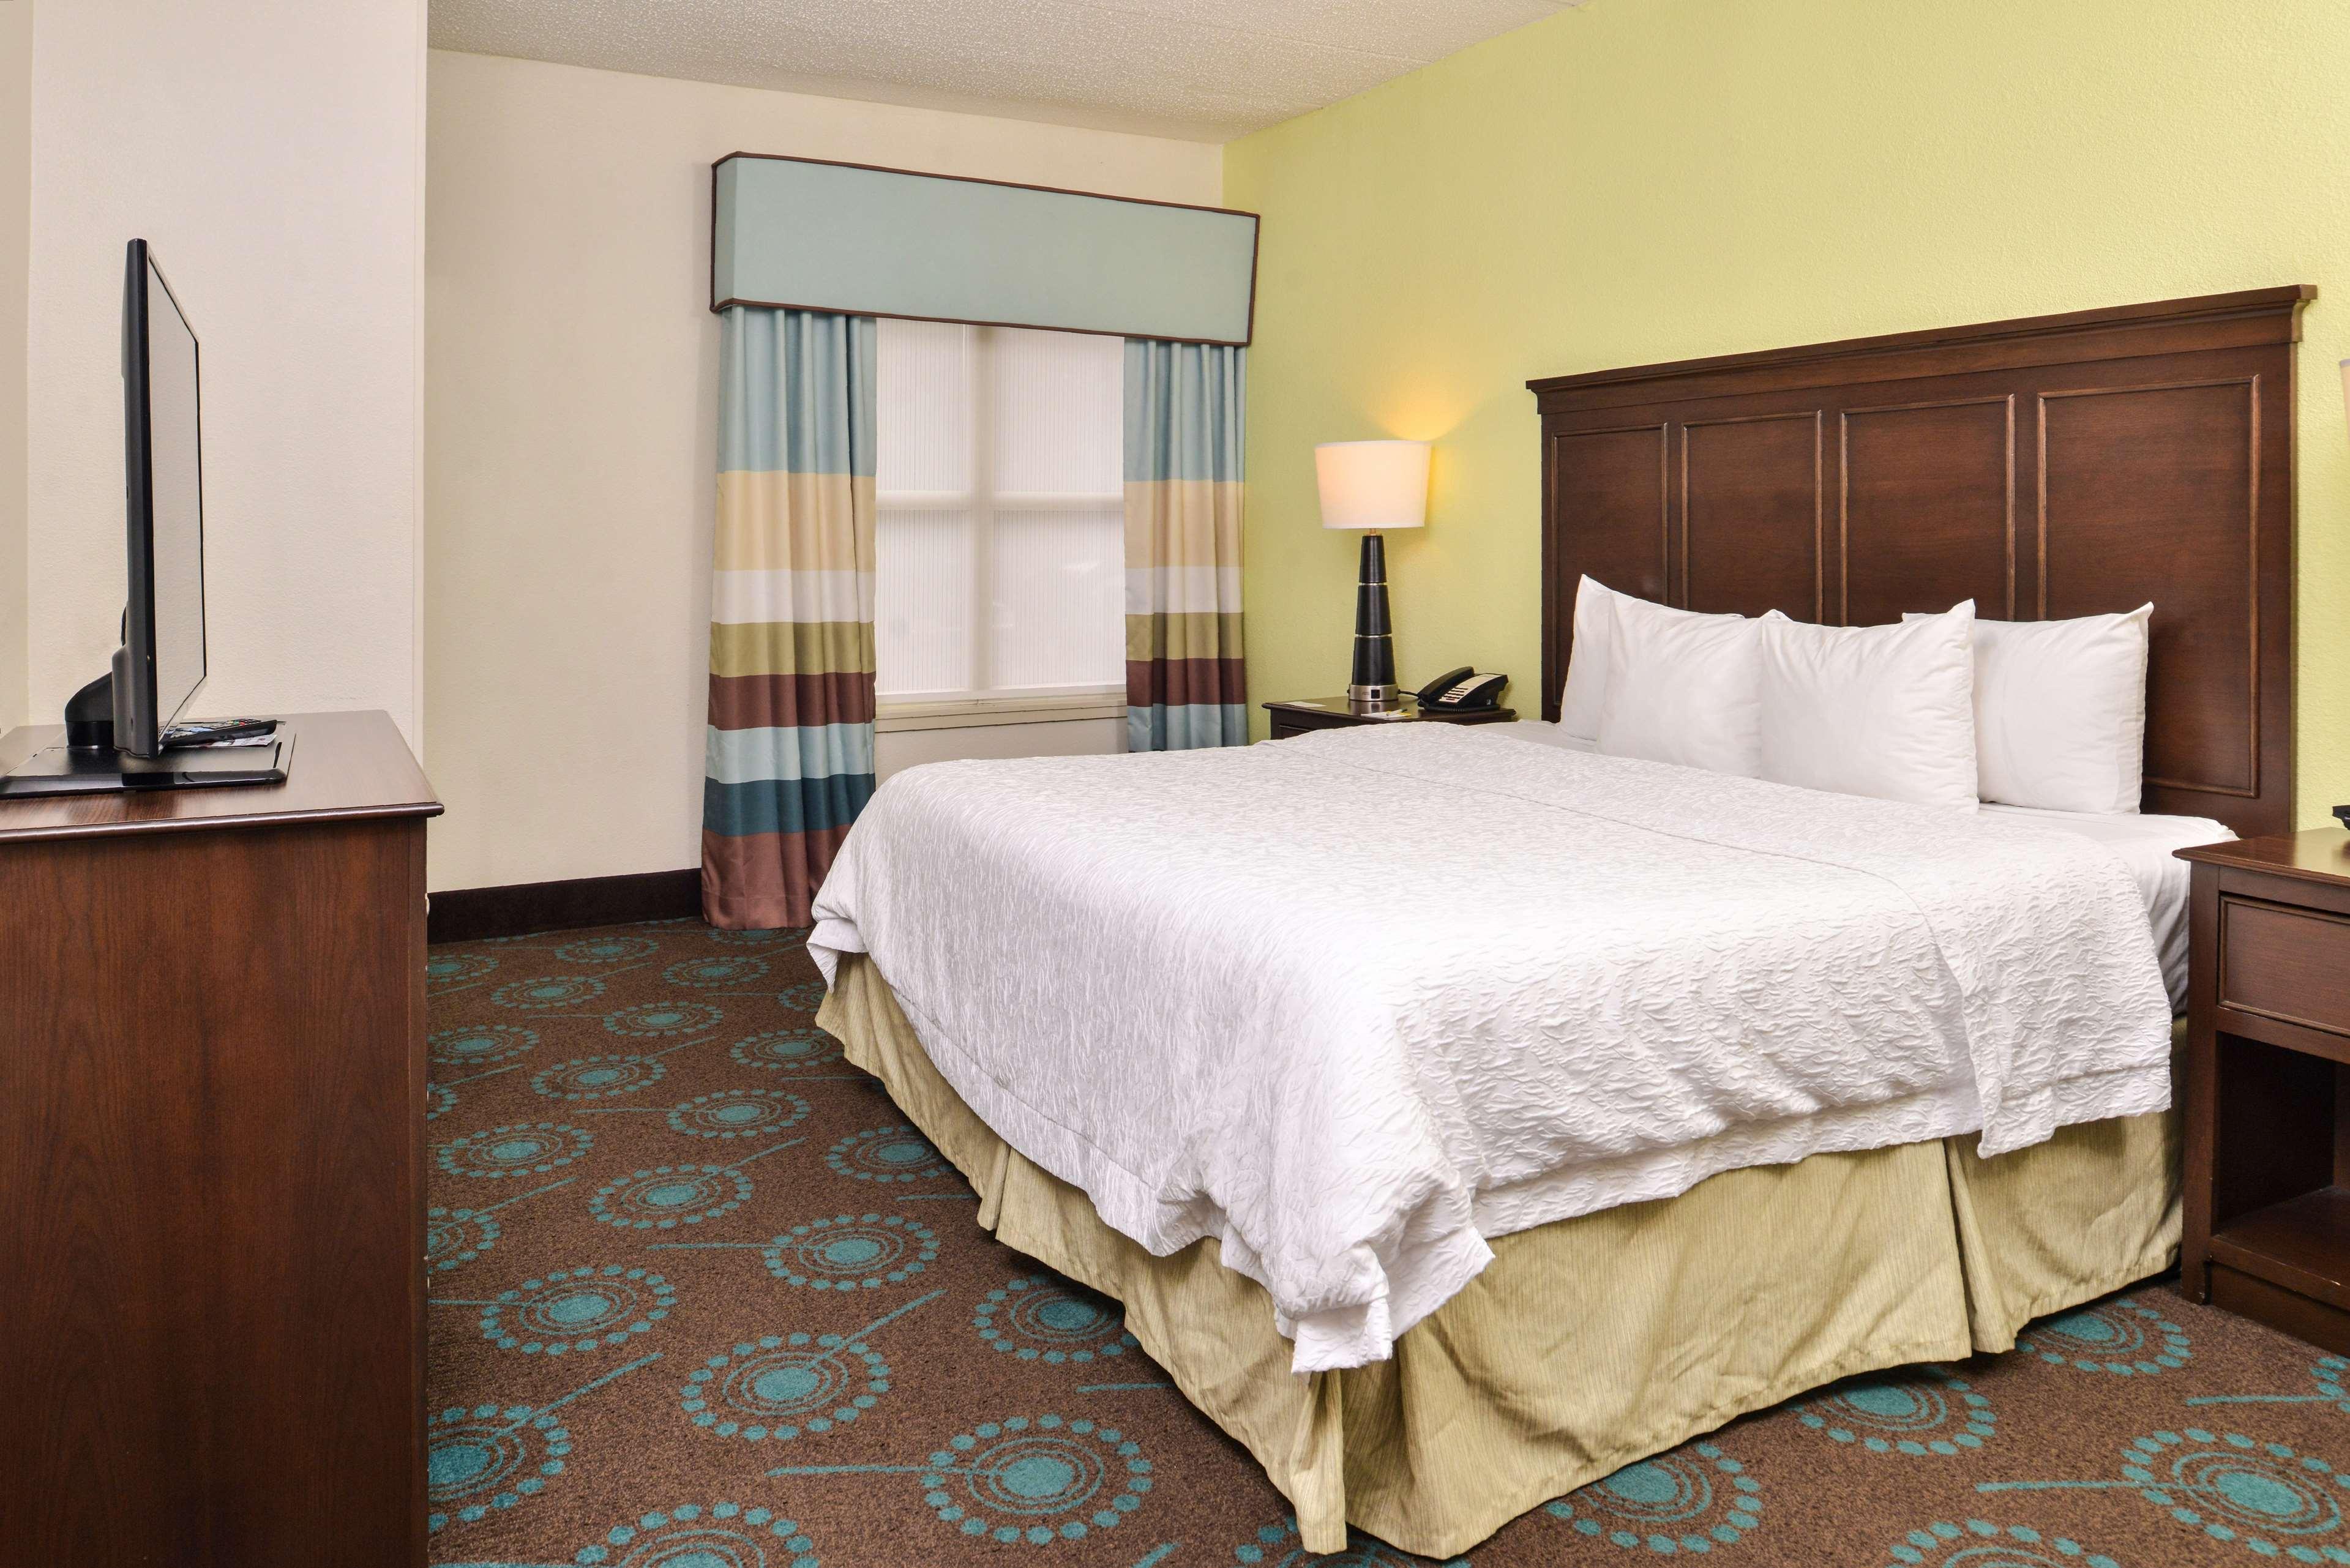 Hampton Inn & Suites Newport News (Oyster Point) image 34